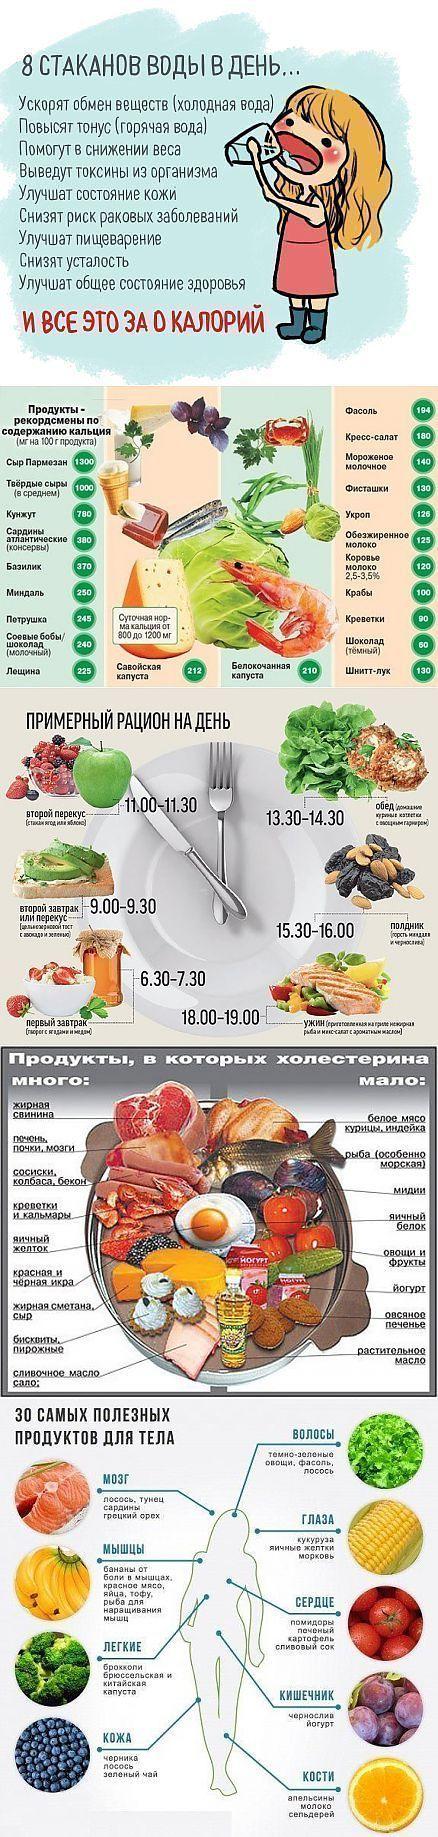 pinme.ru